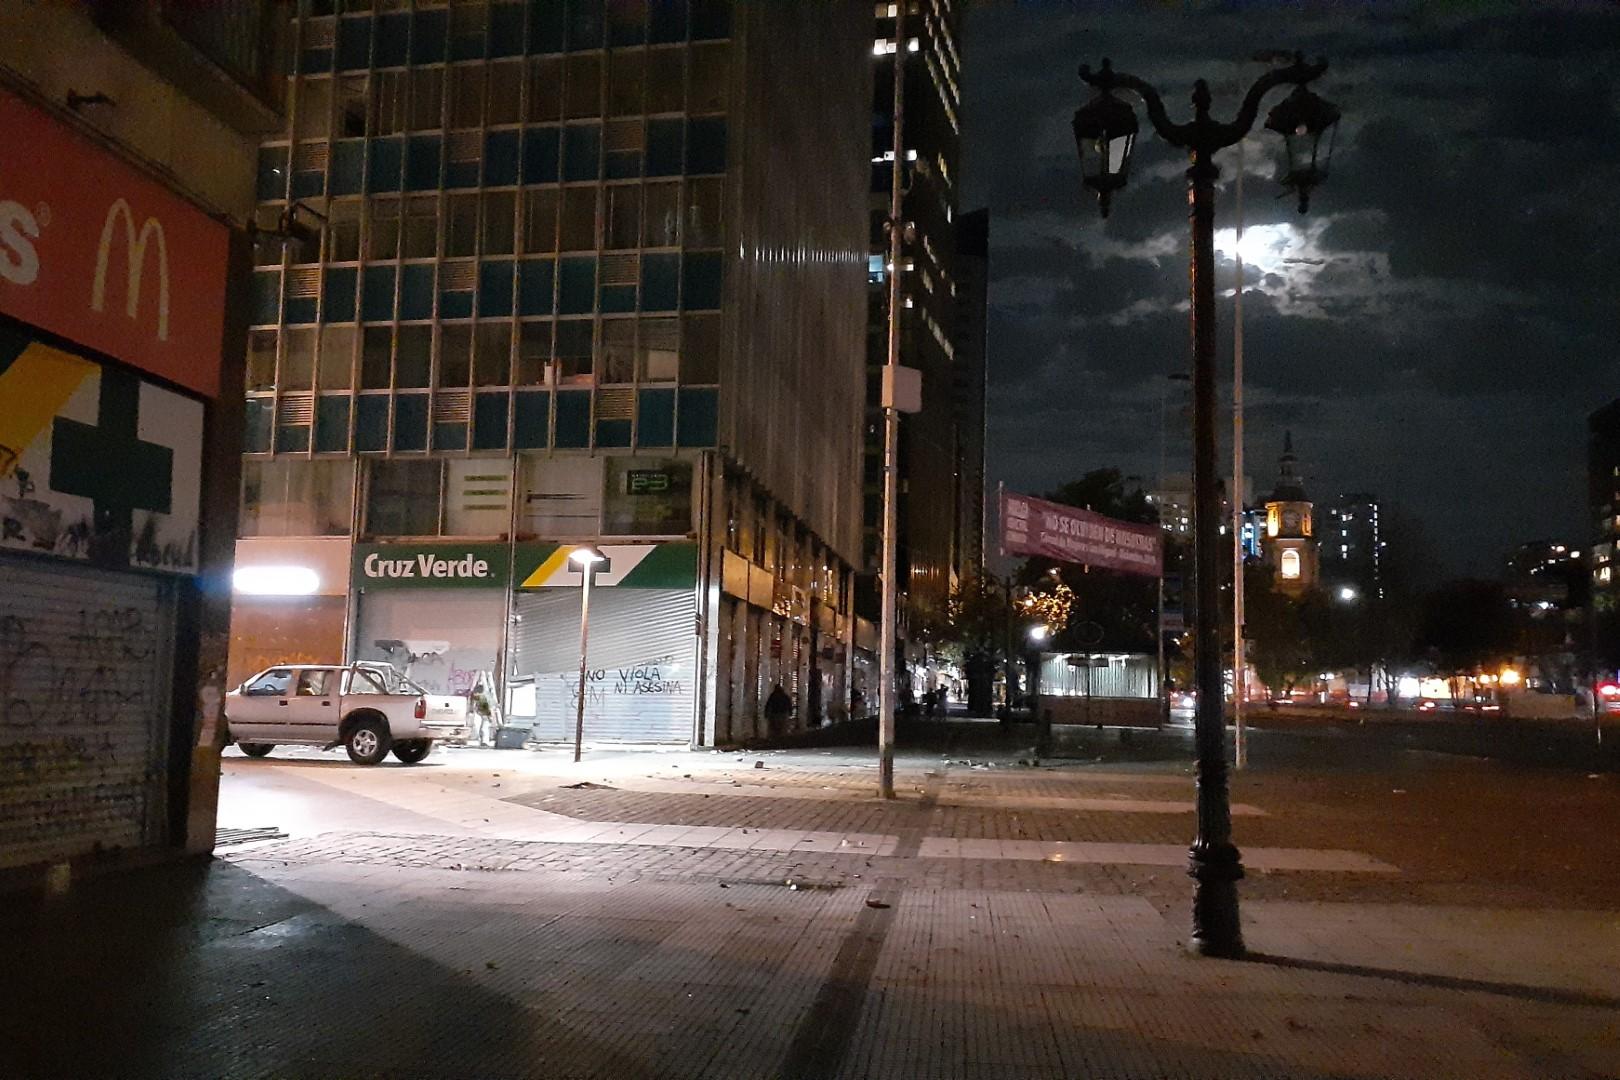 La Alameda, Santiago's main avenue, right after the protests